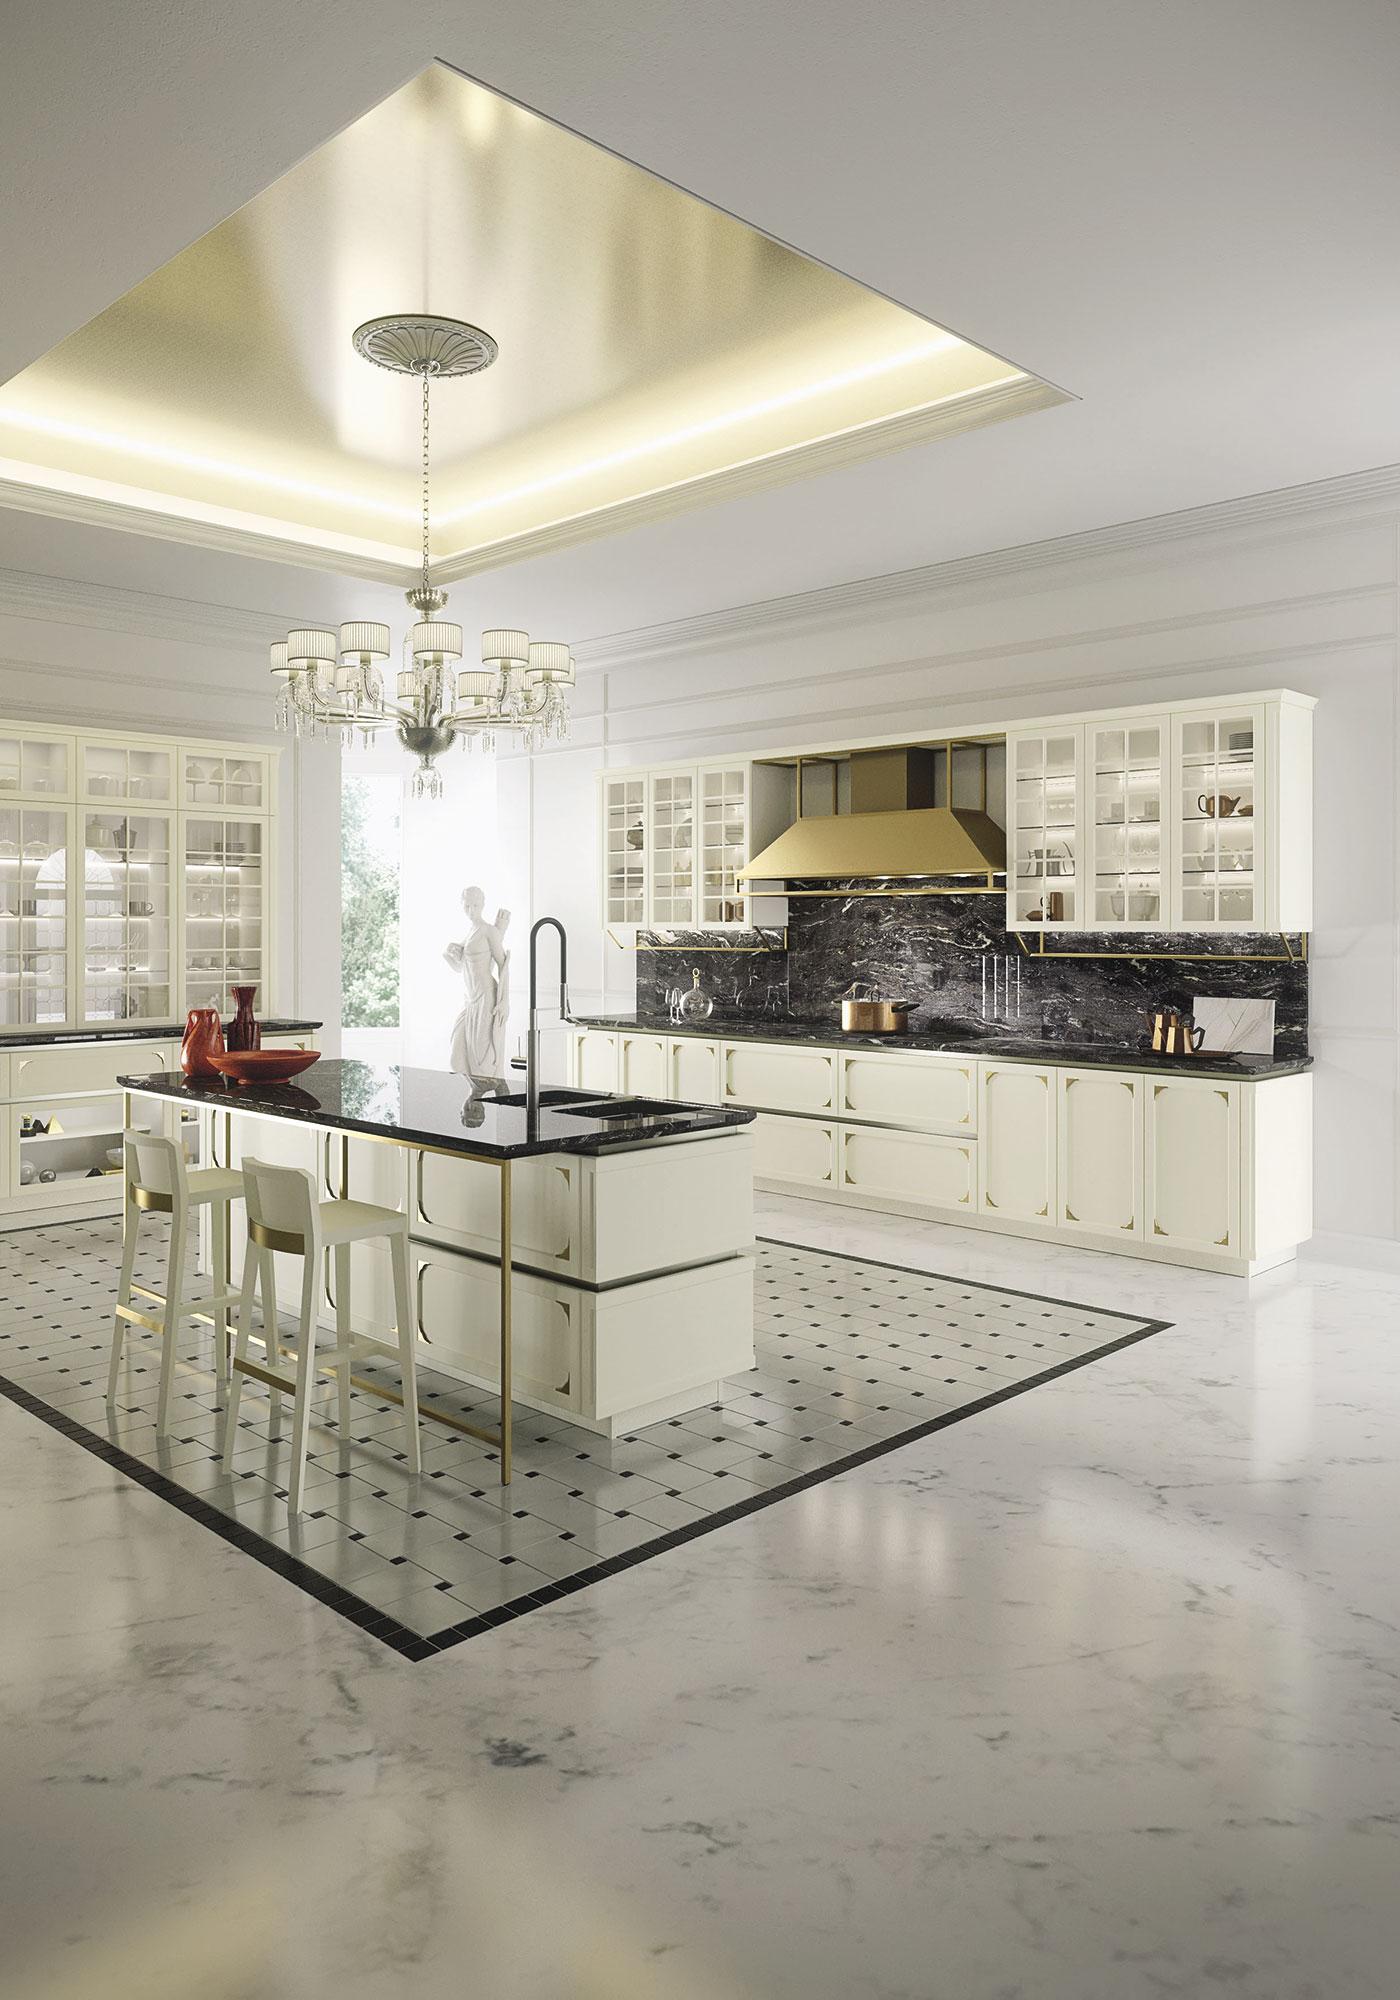 Cucine Moderne Con Isola Snaidero. Good Amazing Cucina Con ...